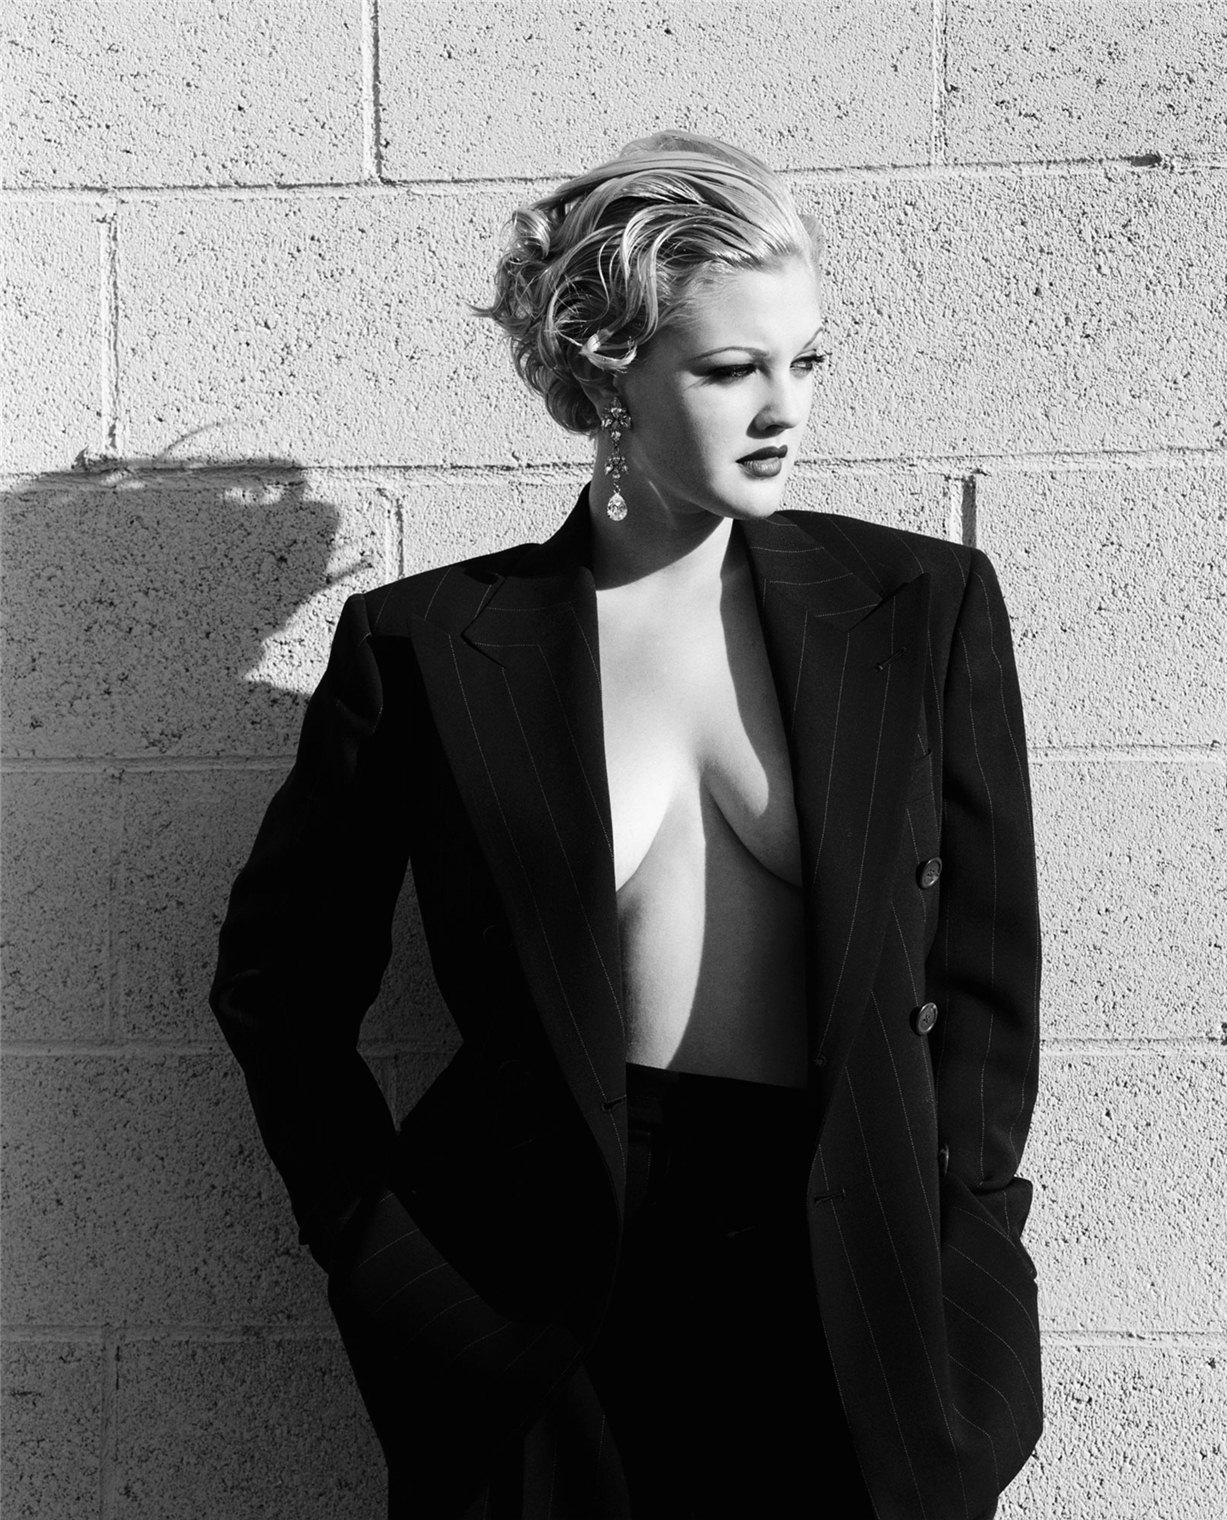 Drew Barrymore / Дрю Бэрримор - звезды Голливуда, фотограф Firooz Zahedi